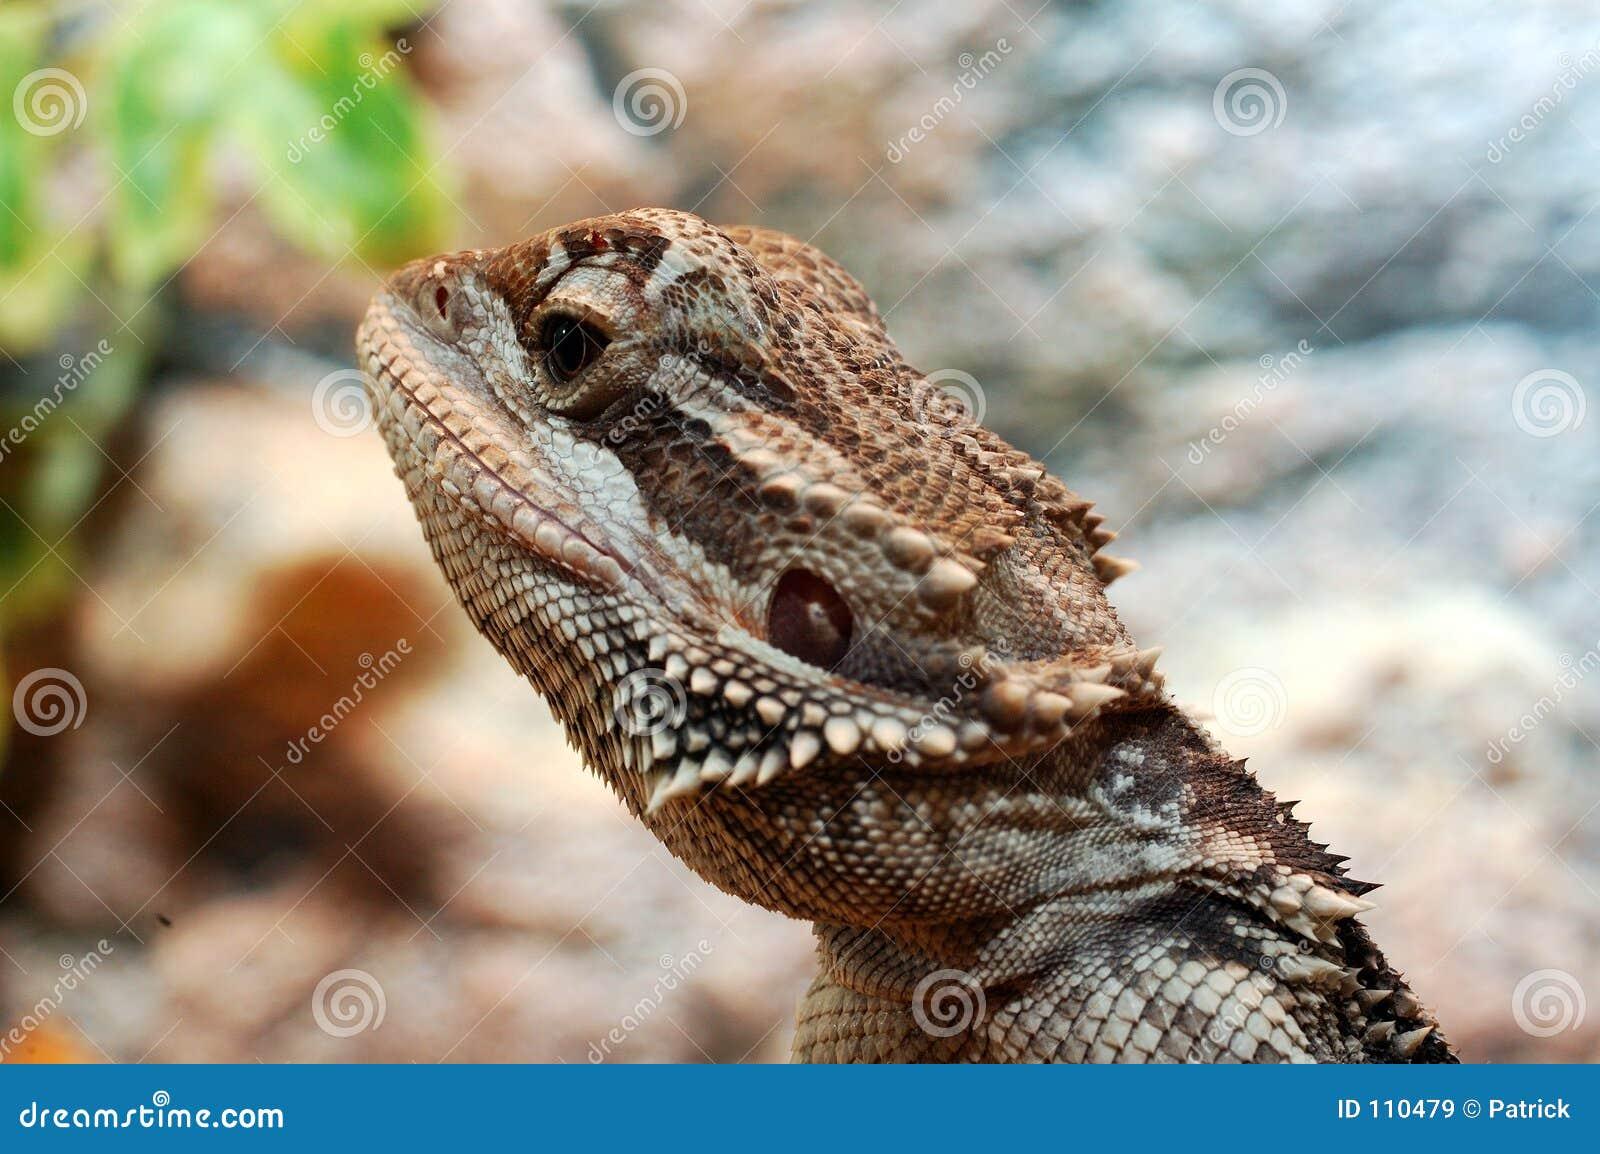 Vitticeps de Pogona, dragão farpado australiano.